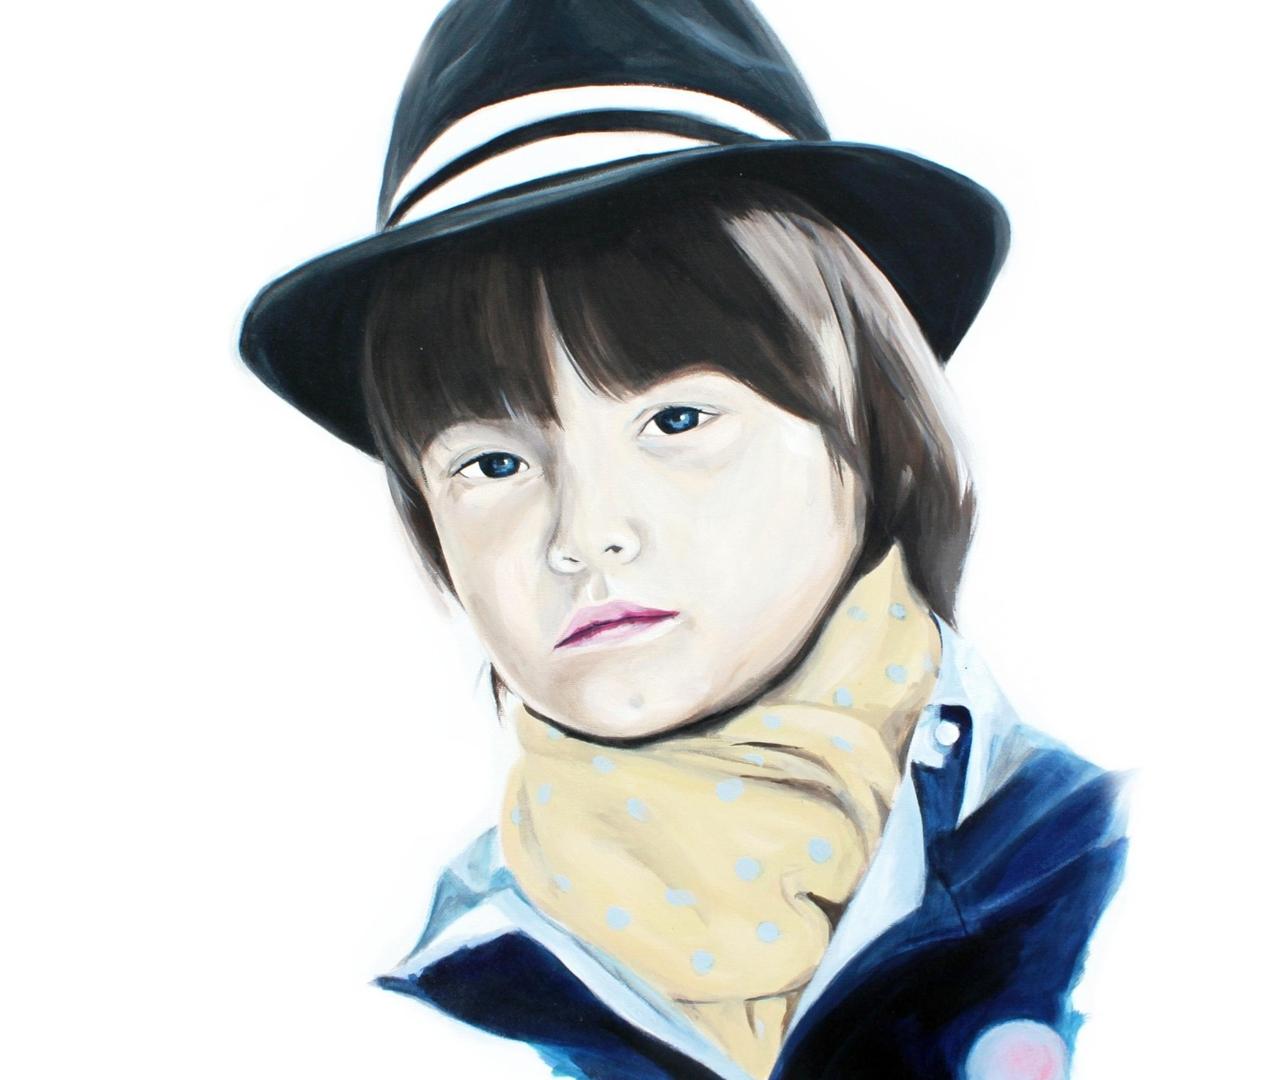 Jacob image